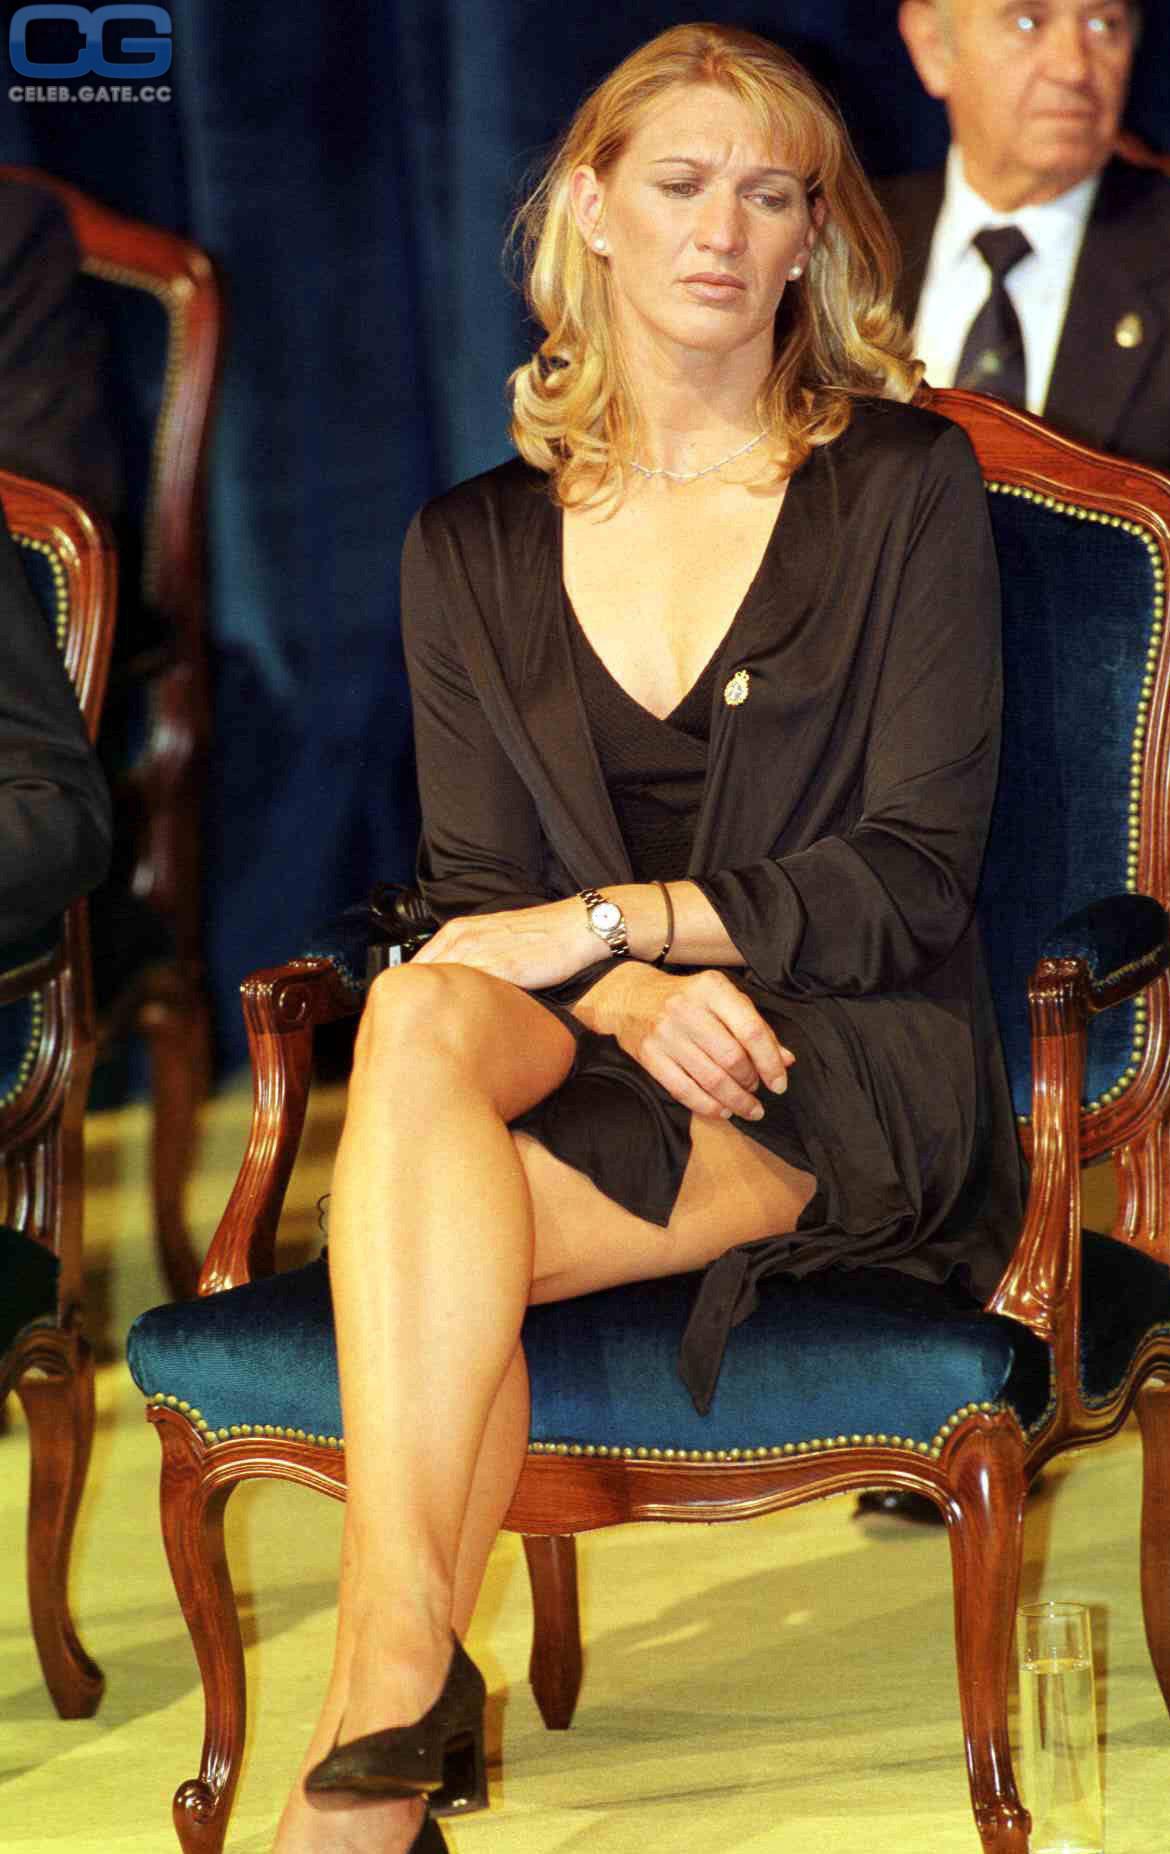 Graf nackt stefie Martina Hingis